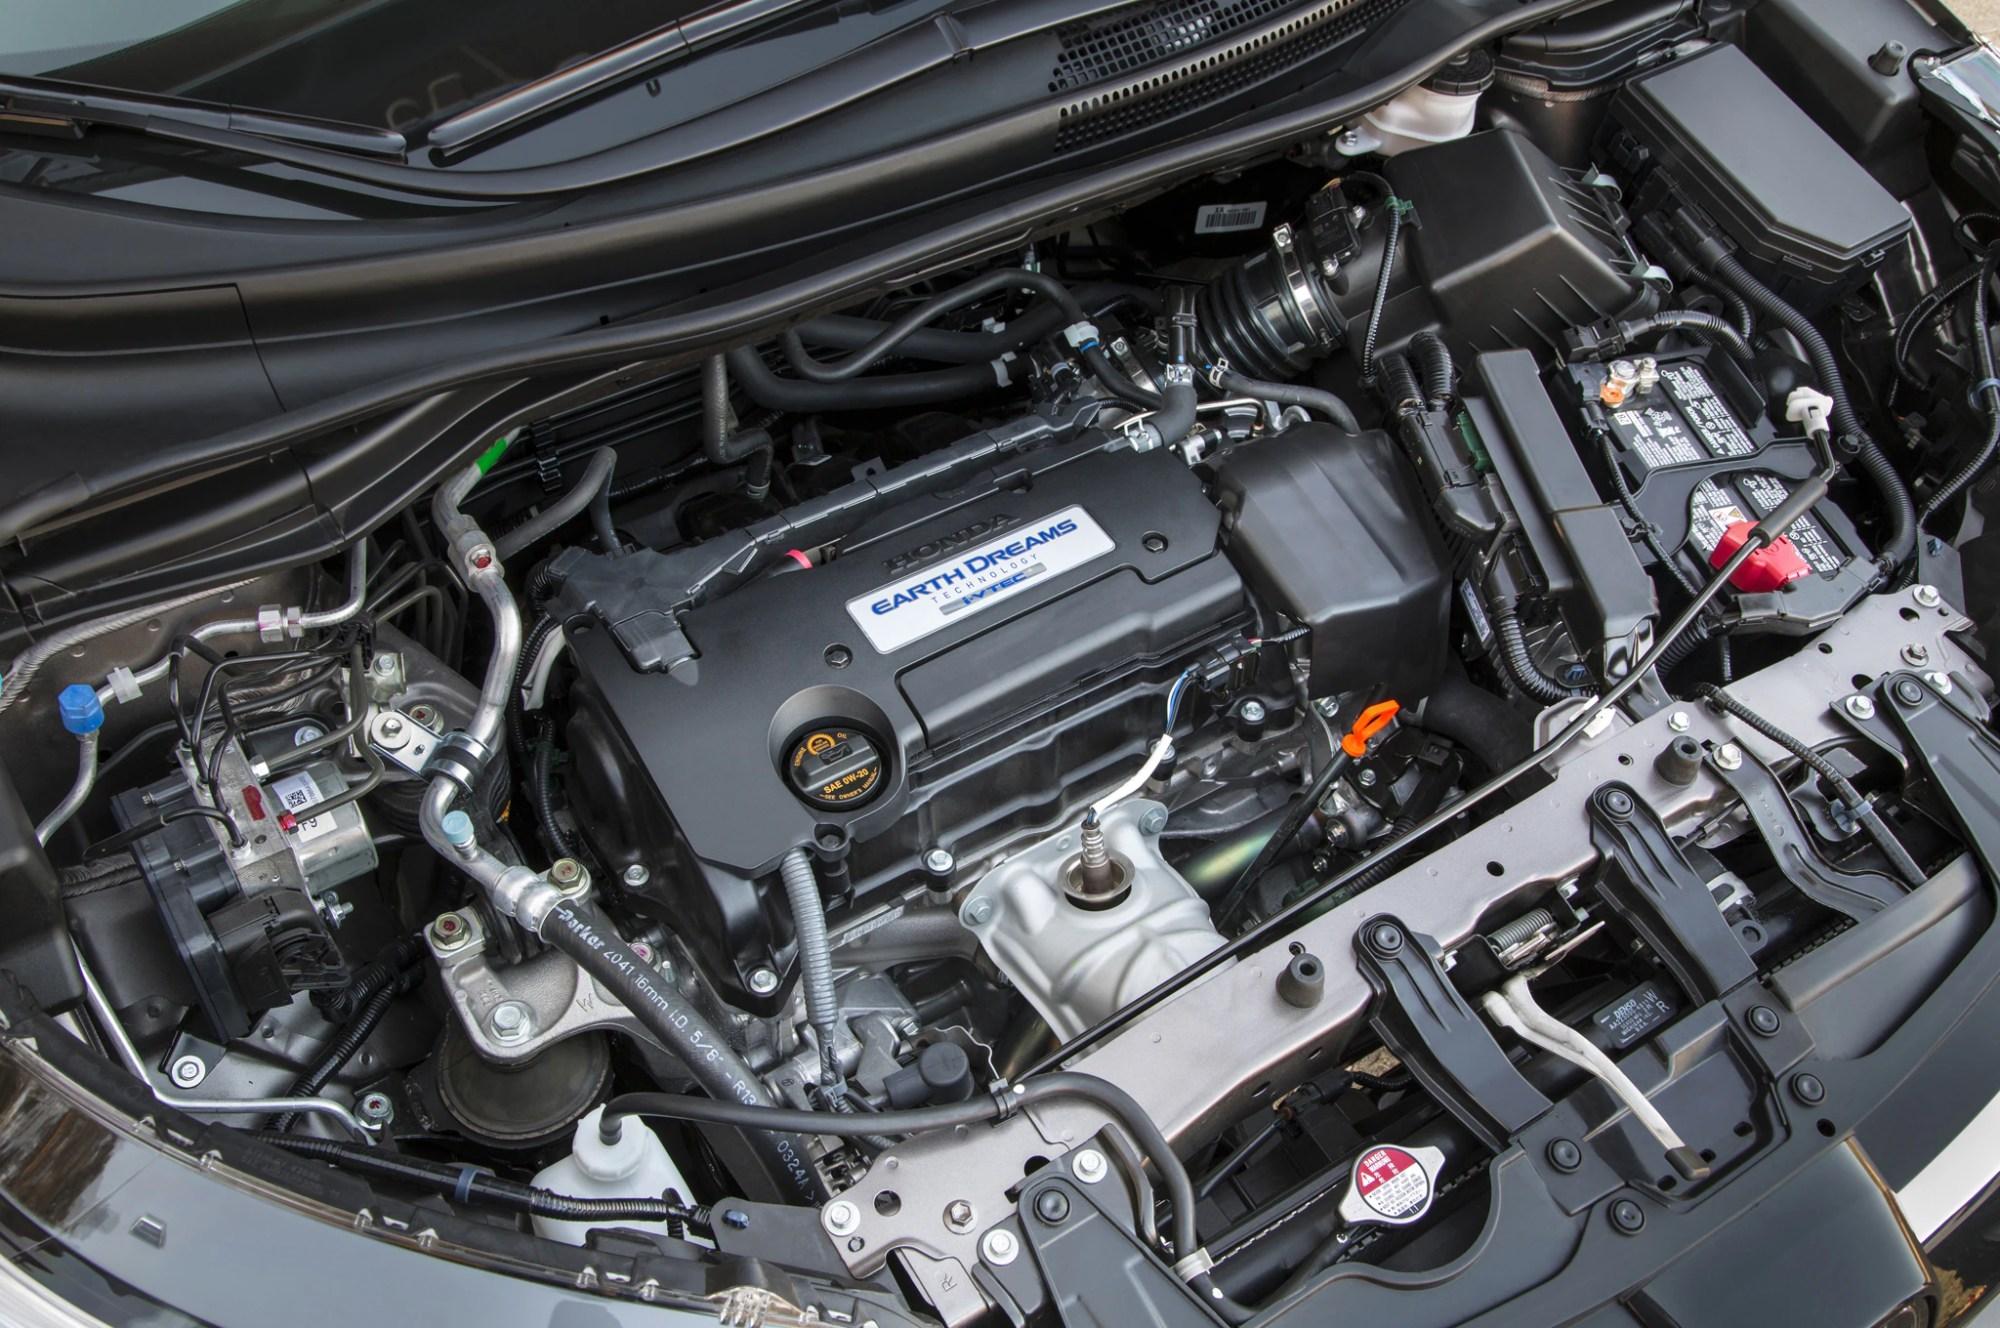 hight resolution of 2015 honda cr v refreshed with new engine improved mpg 2014 honda cr v wiring diagrams 2015 honda cr v engine wiring diagram